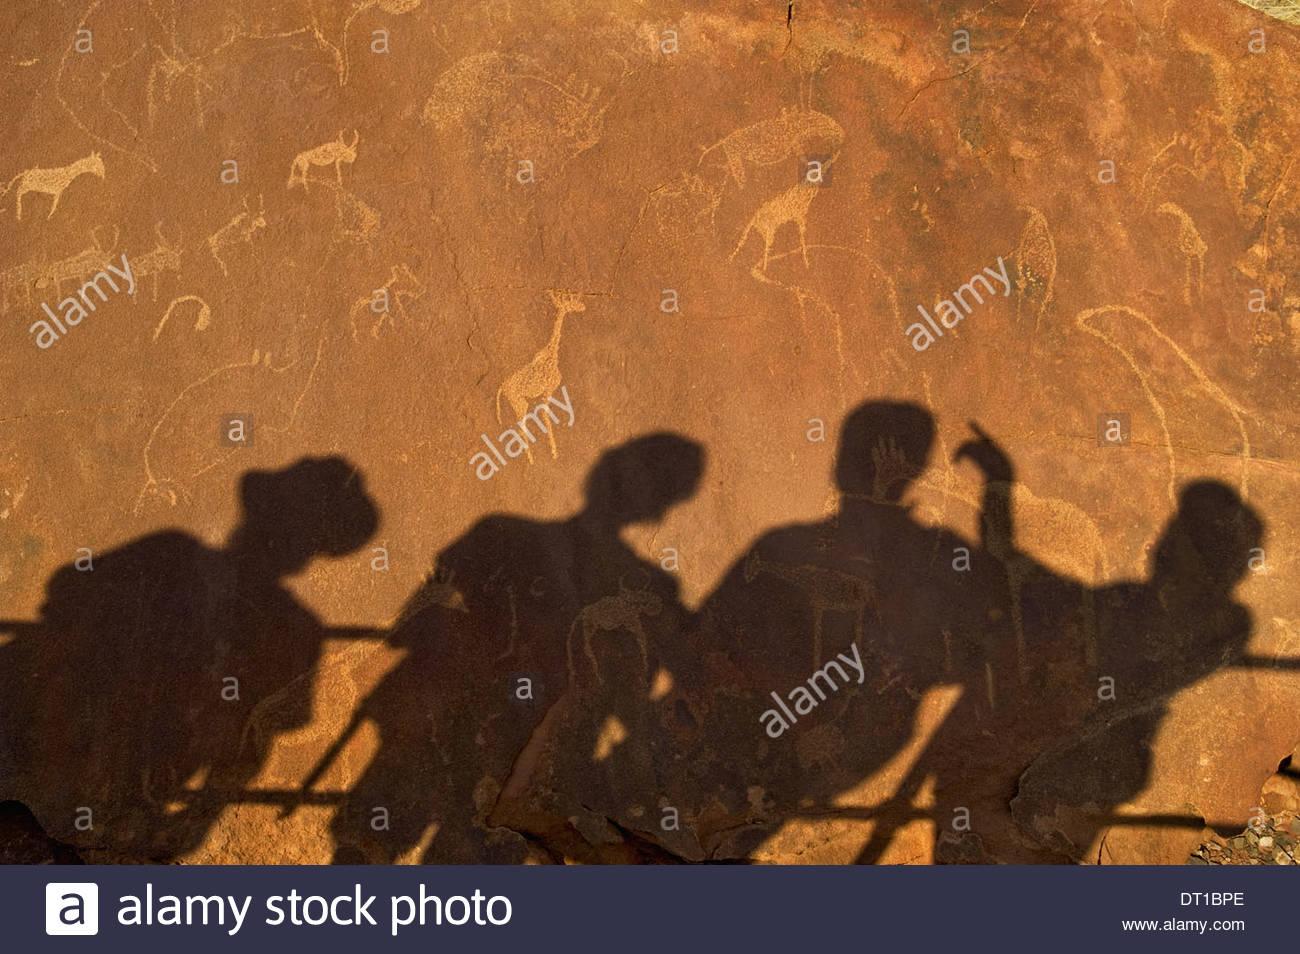 Uibasen Conservancy Damaraland Namibia. shadows tourists rock Twyfelfontein heritage site - Stock Image